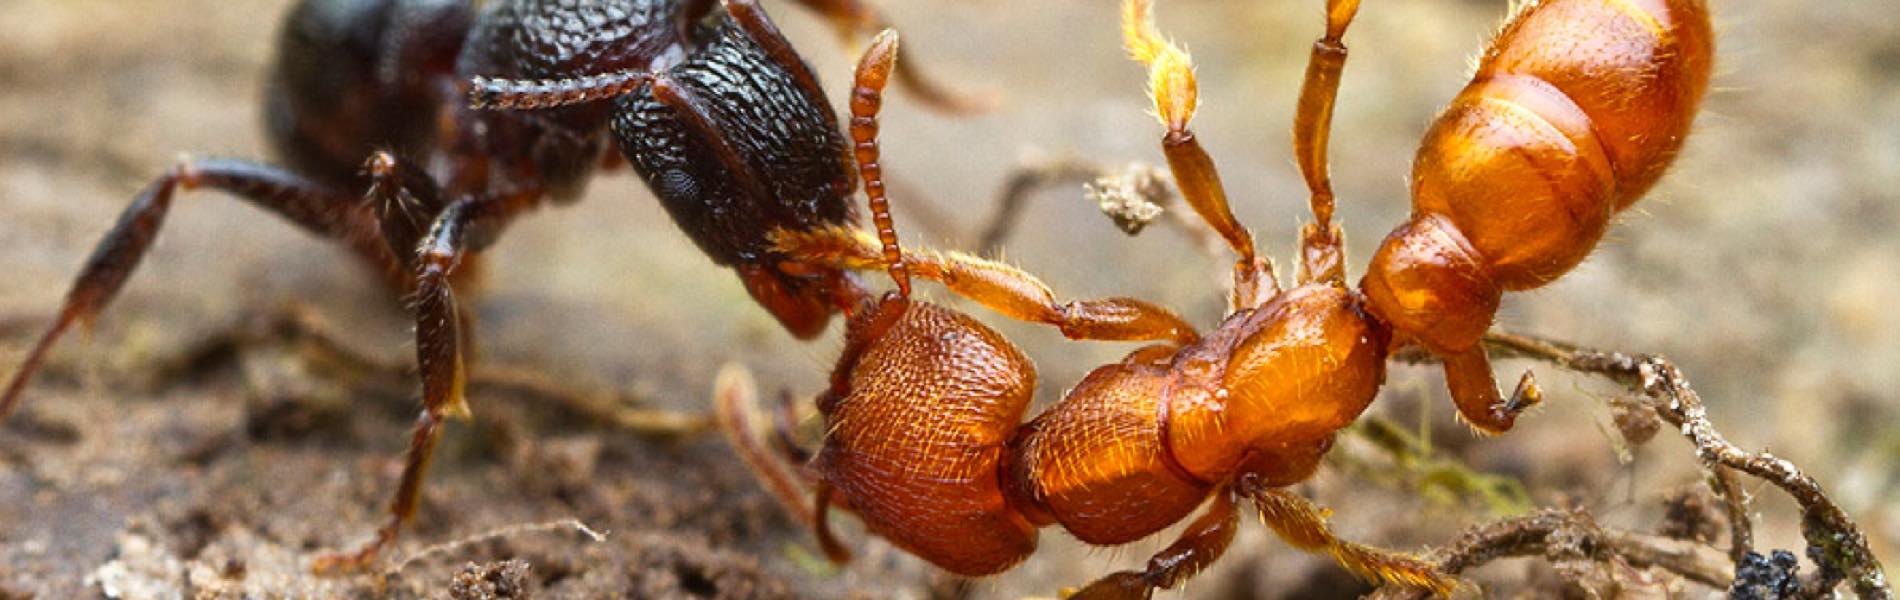 ants-blog